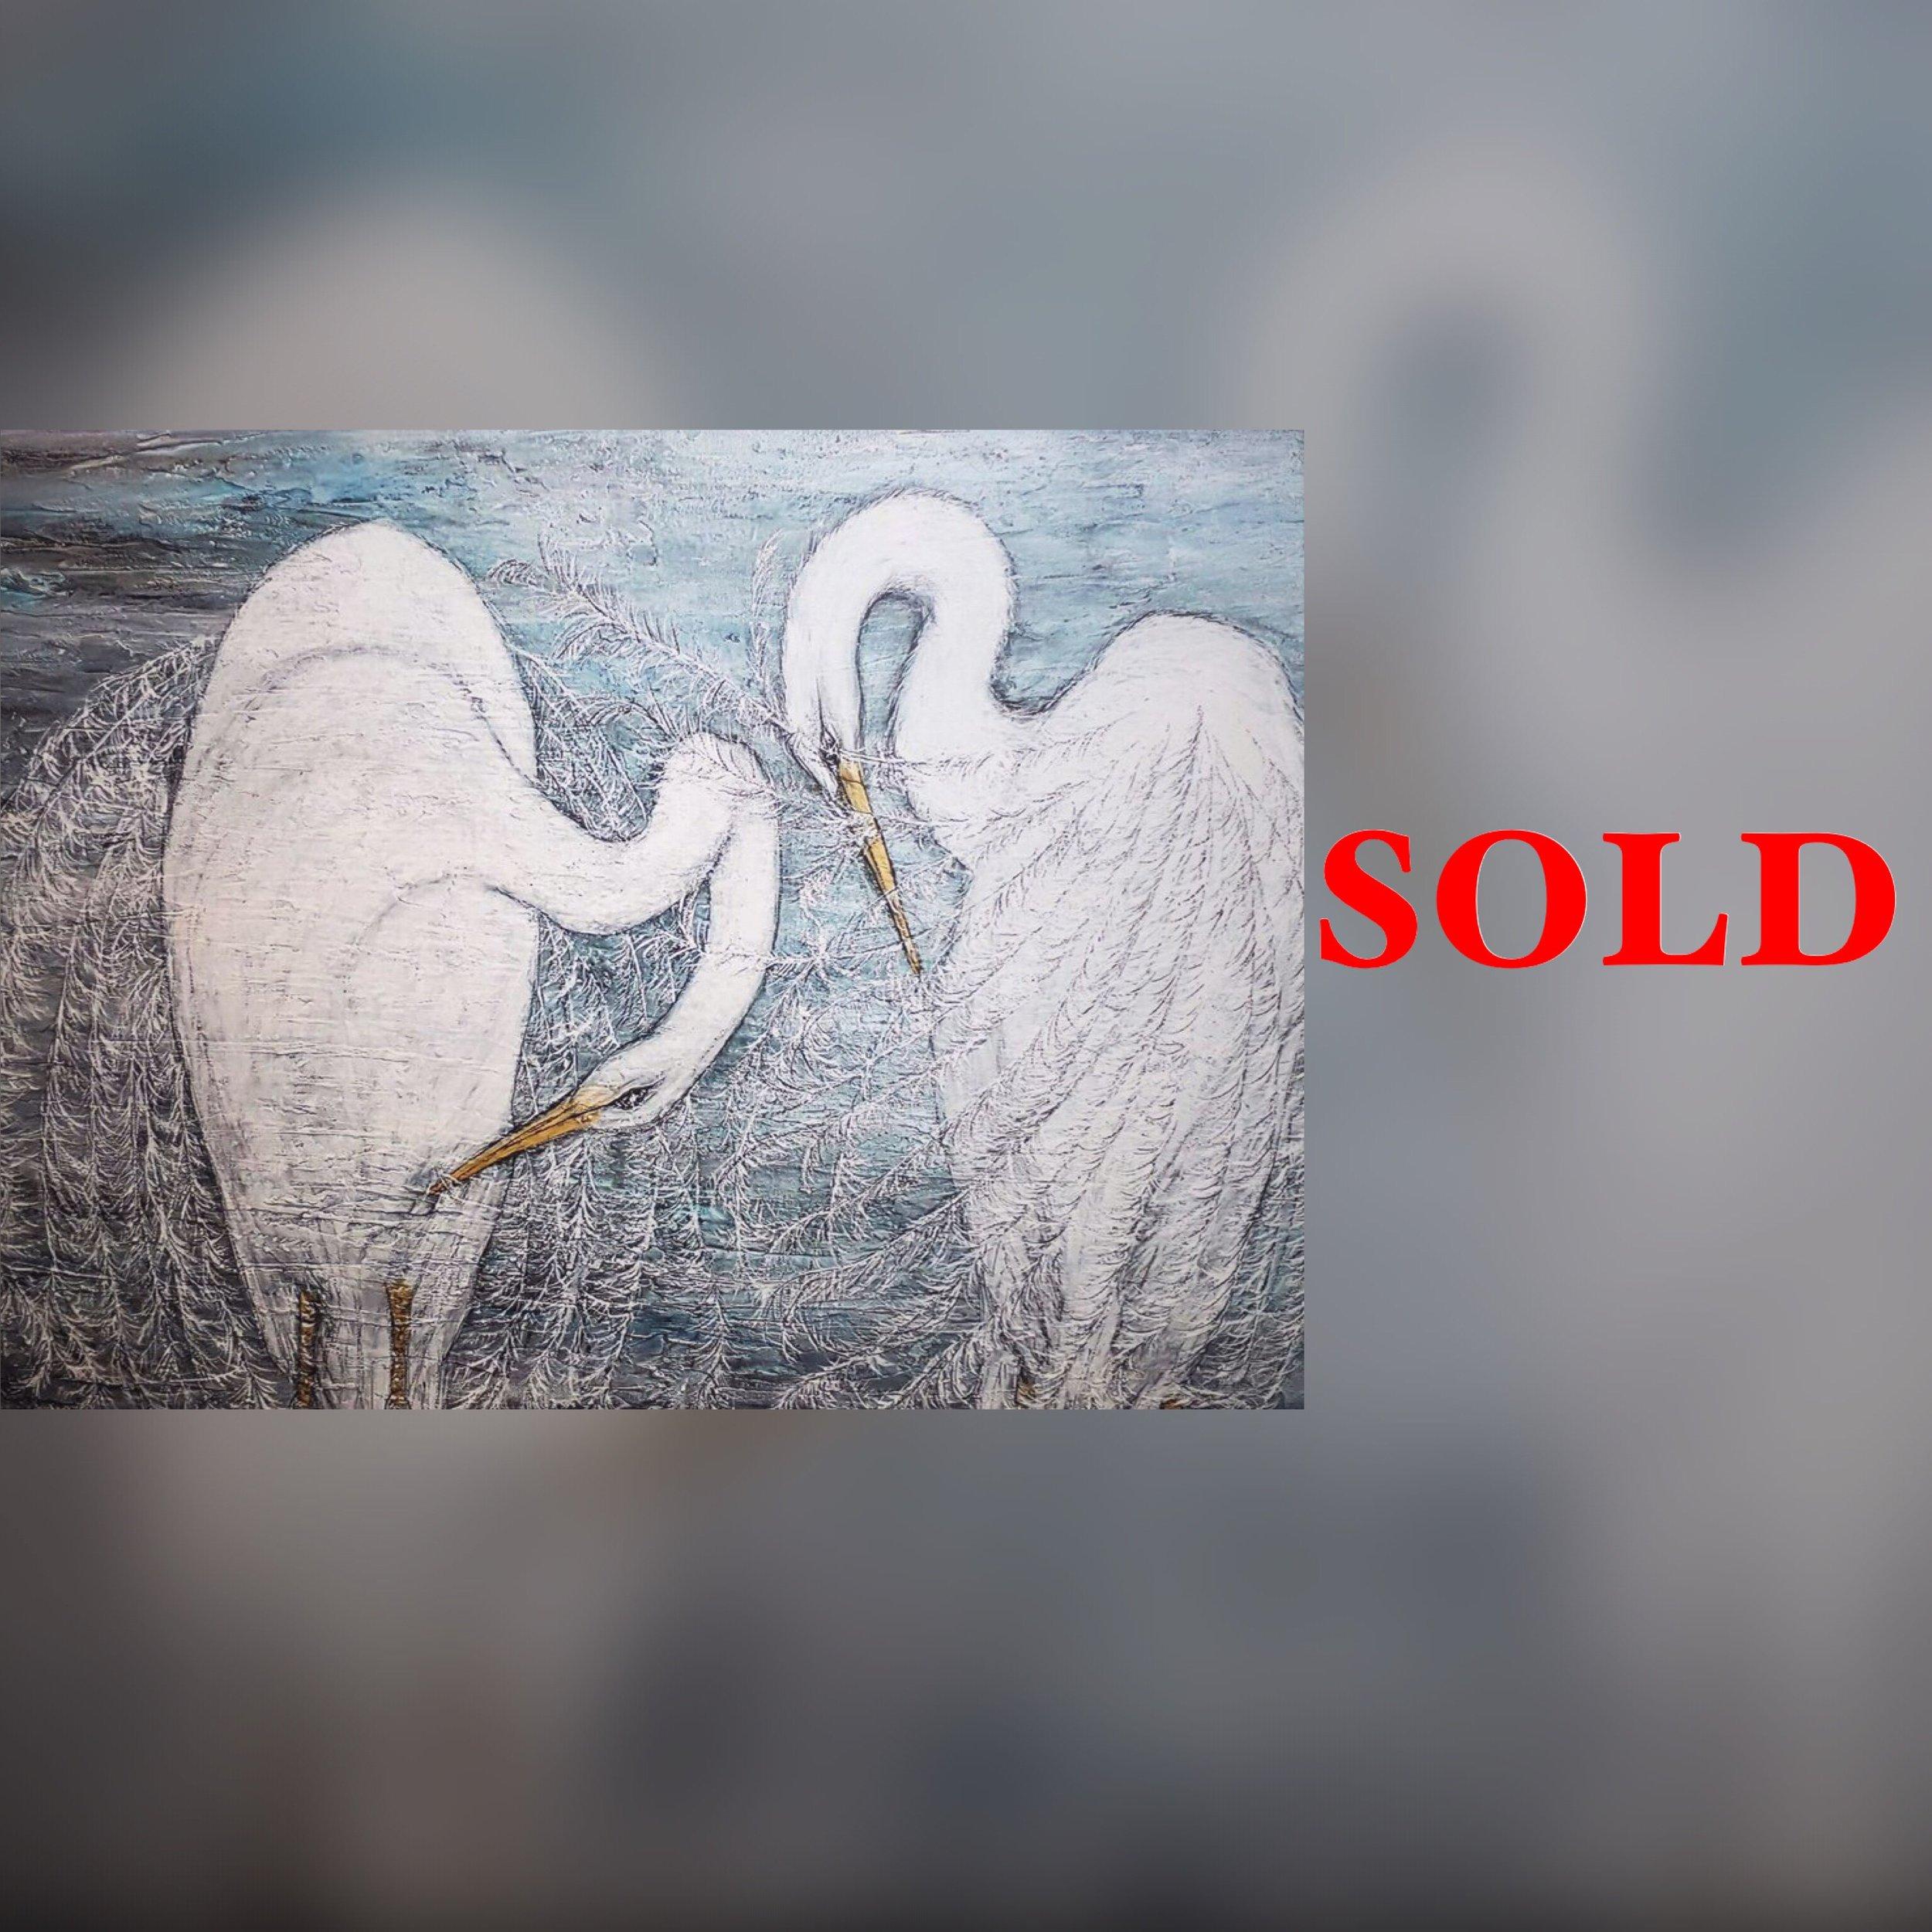 Twin Birds Sold.jpg